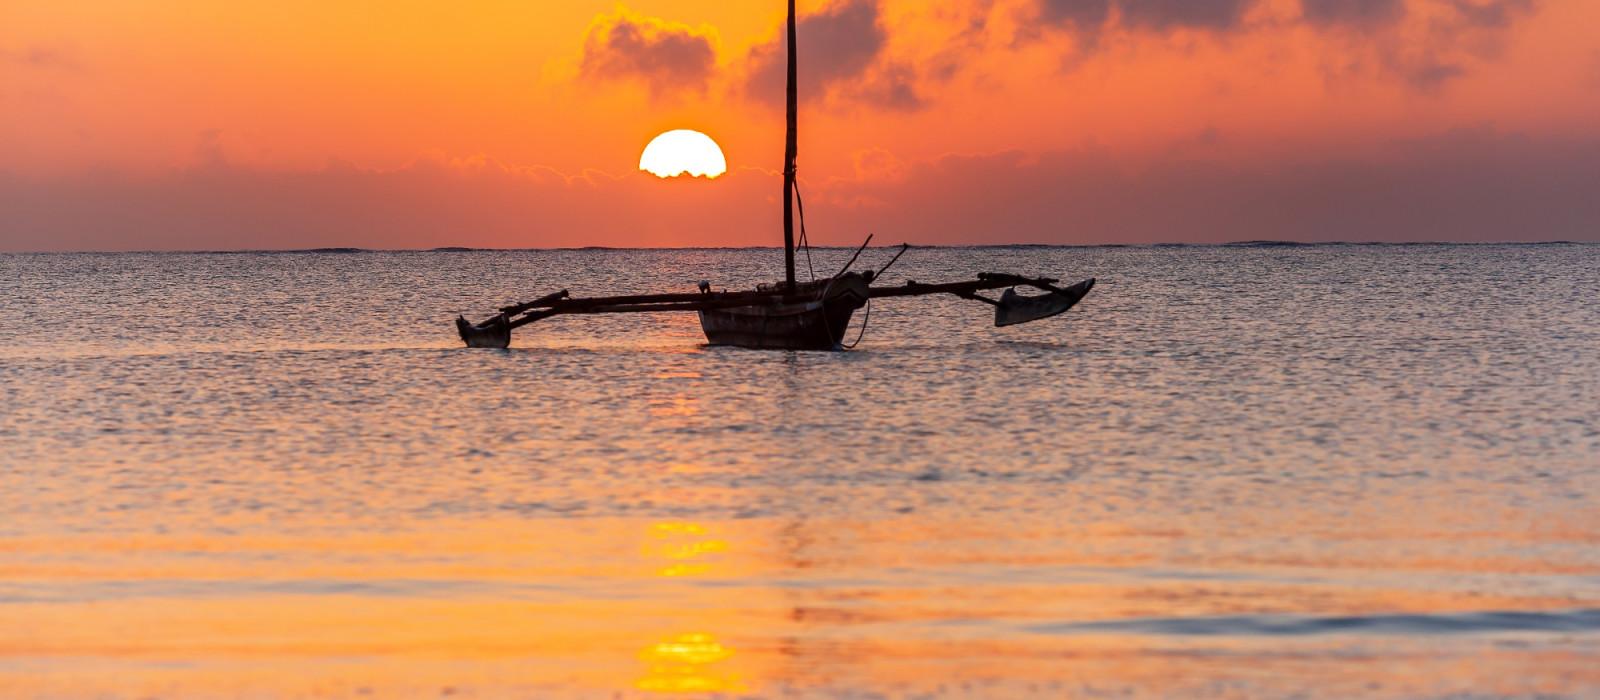 Kenia luxuriös – Wander-Safari, Strand und traumhafte Lodges Urlaub 1